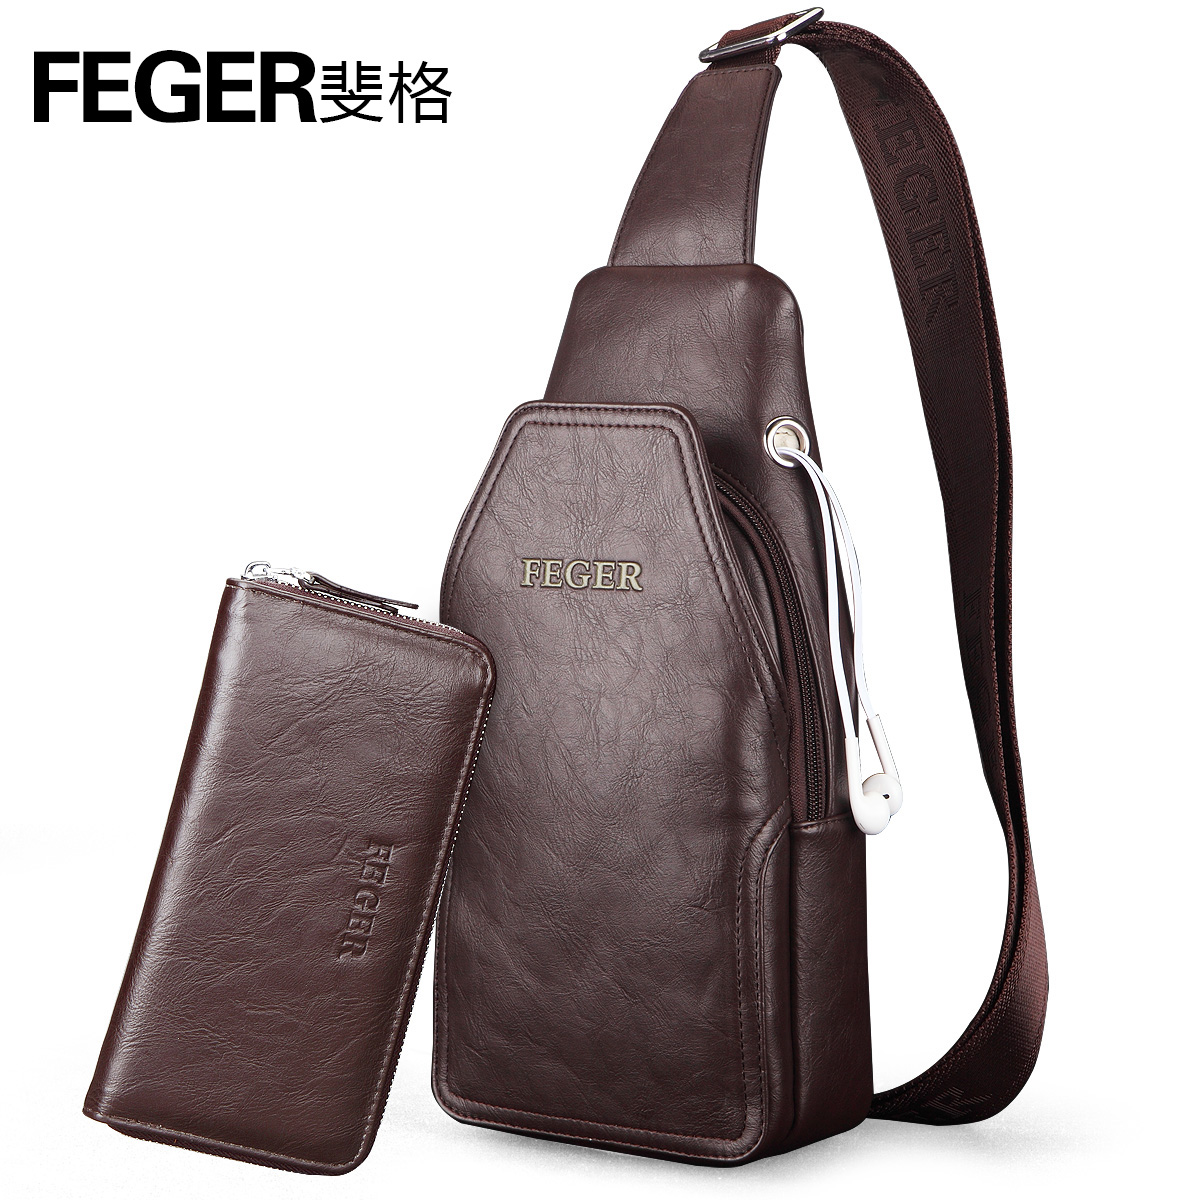 FEGER男士韩版斜挎胸包单肩包